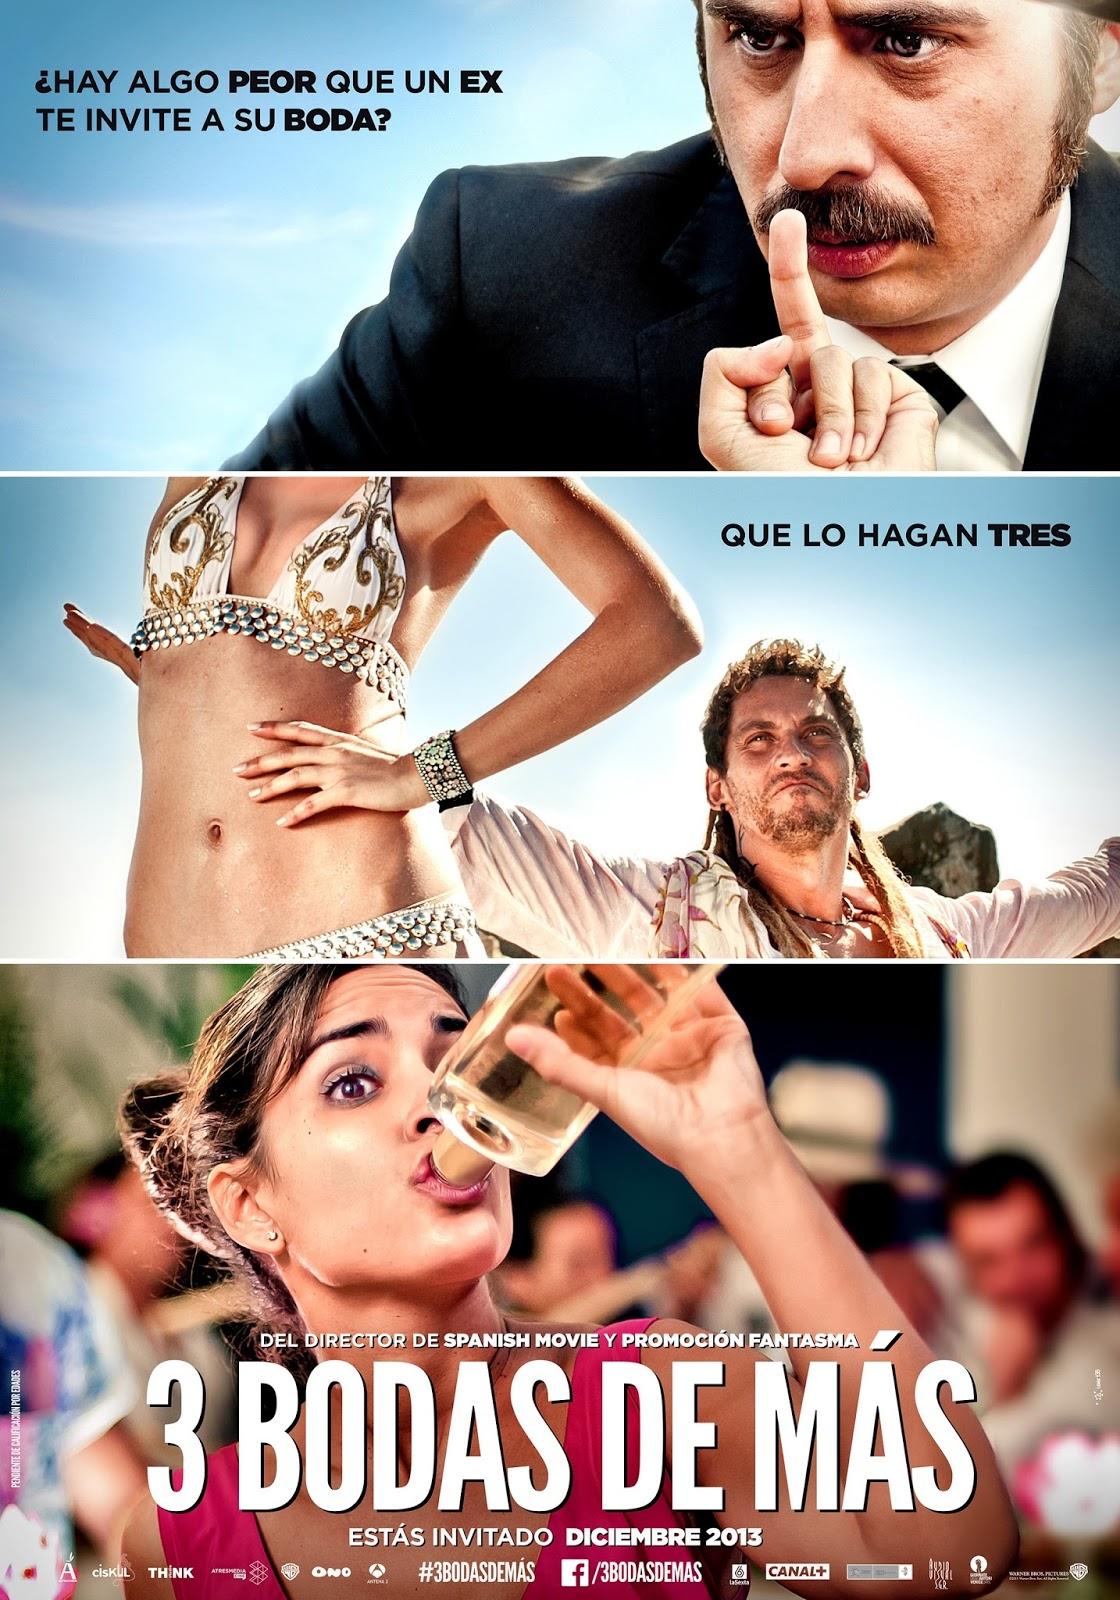 3 Bodas De Mas (2013)